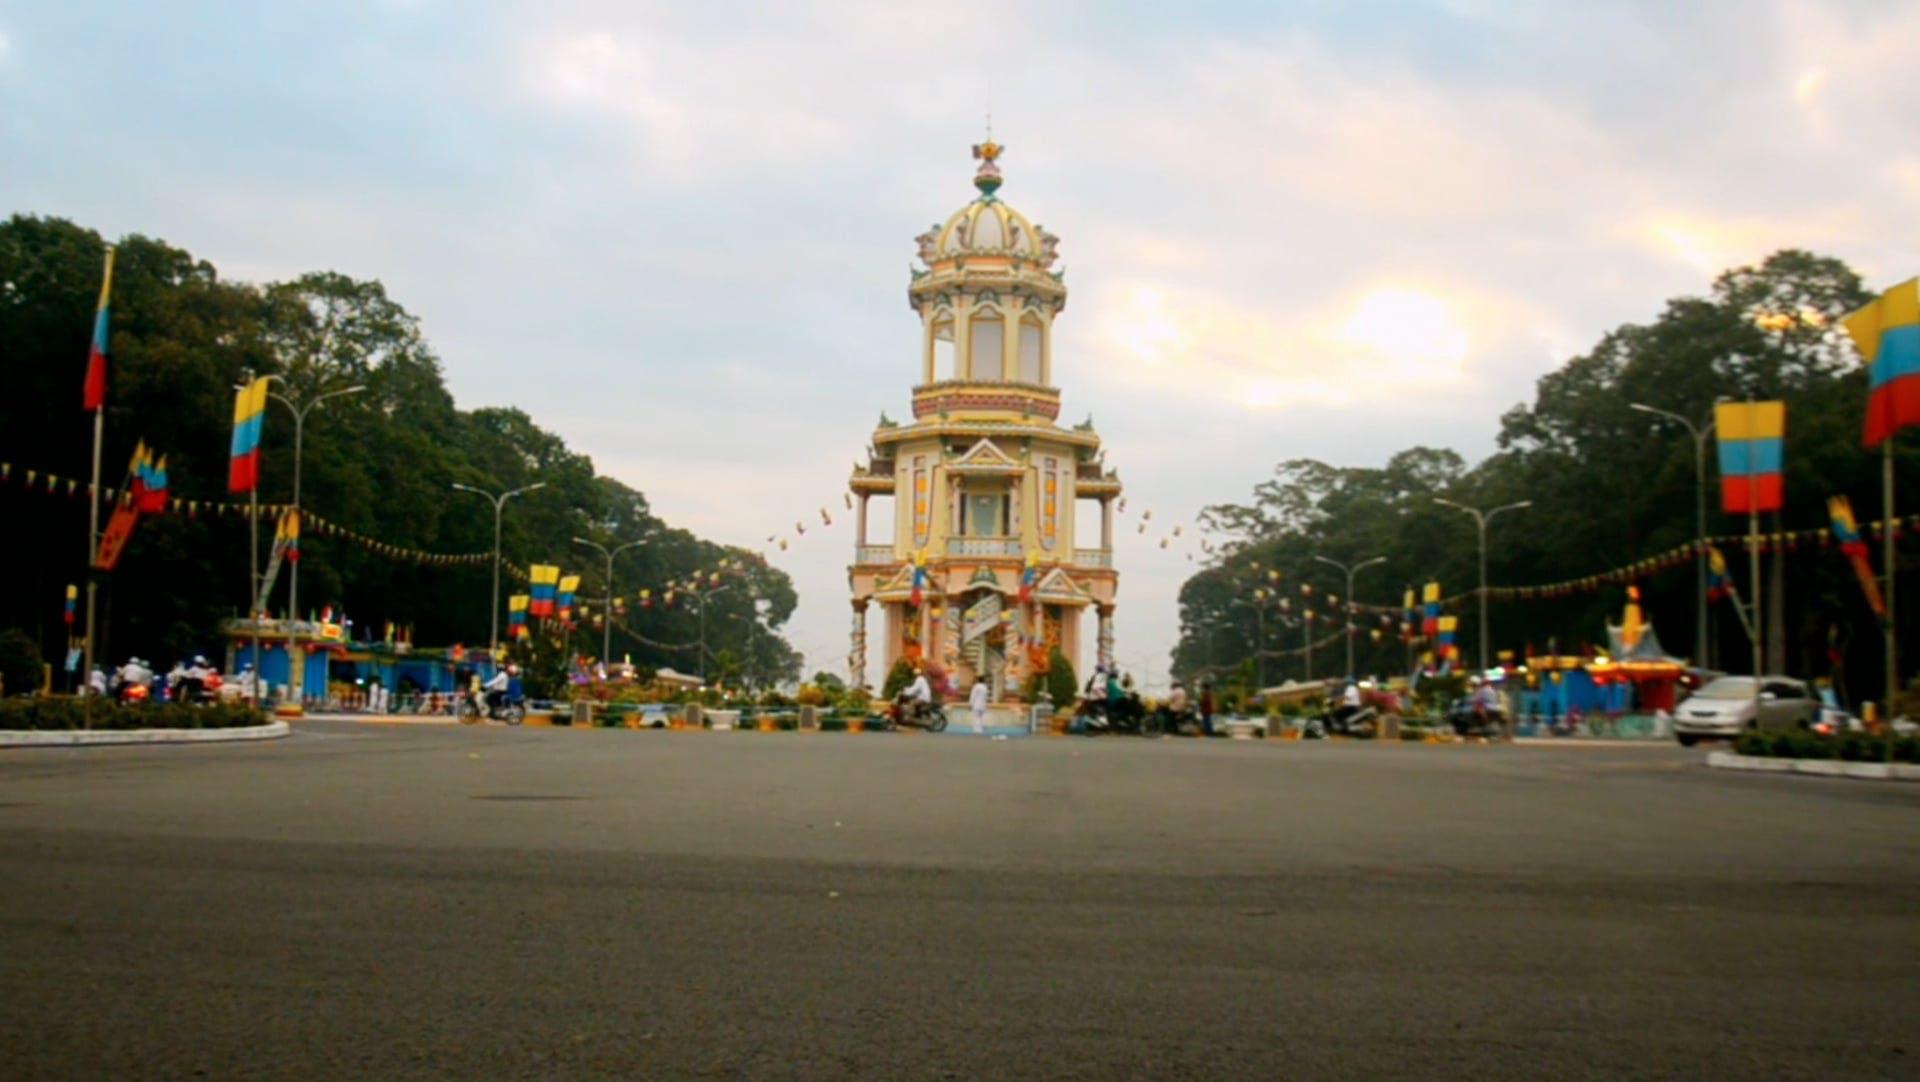 Buddhist Temple Having A Celebration